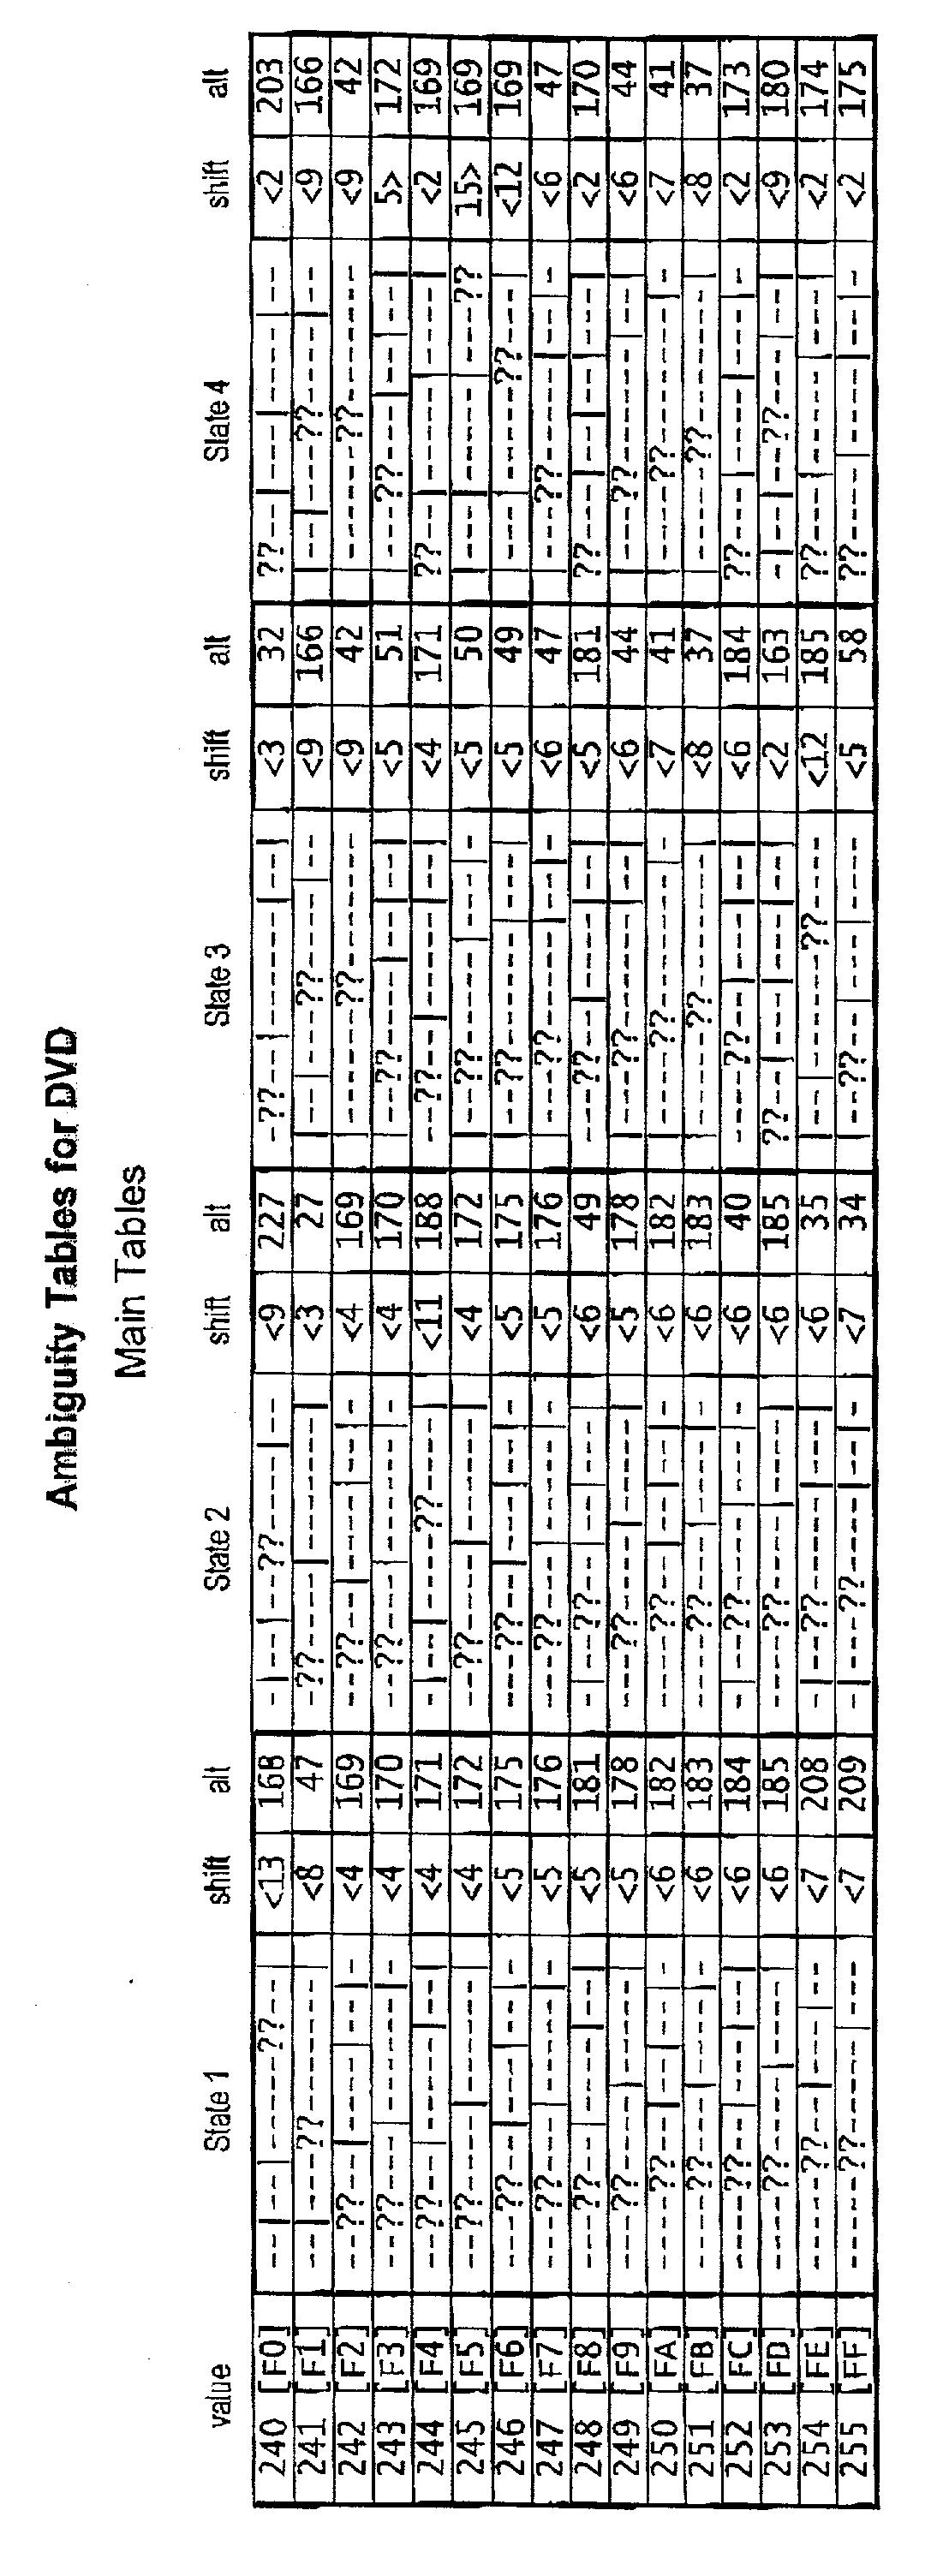 Figure US20020069389A1-20020606-P00008